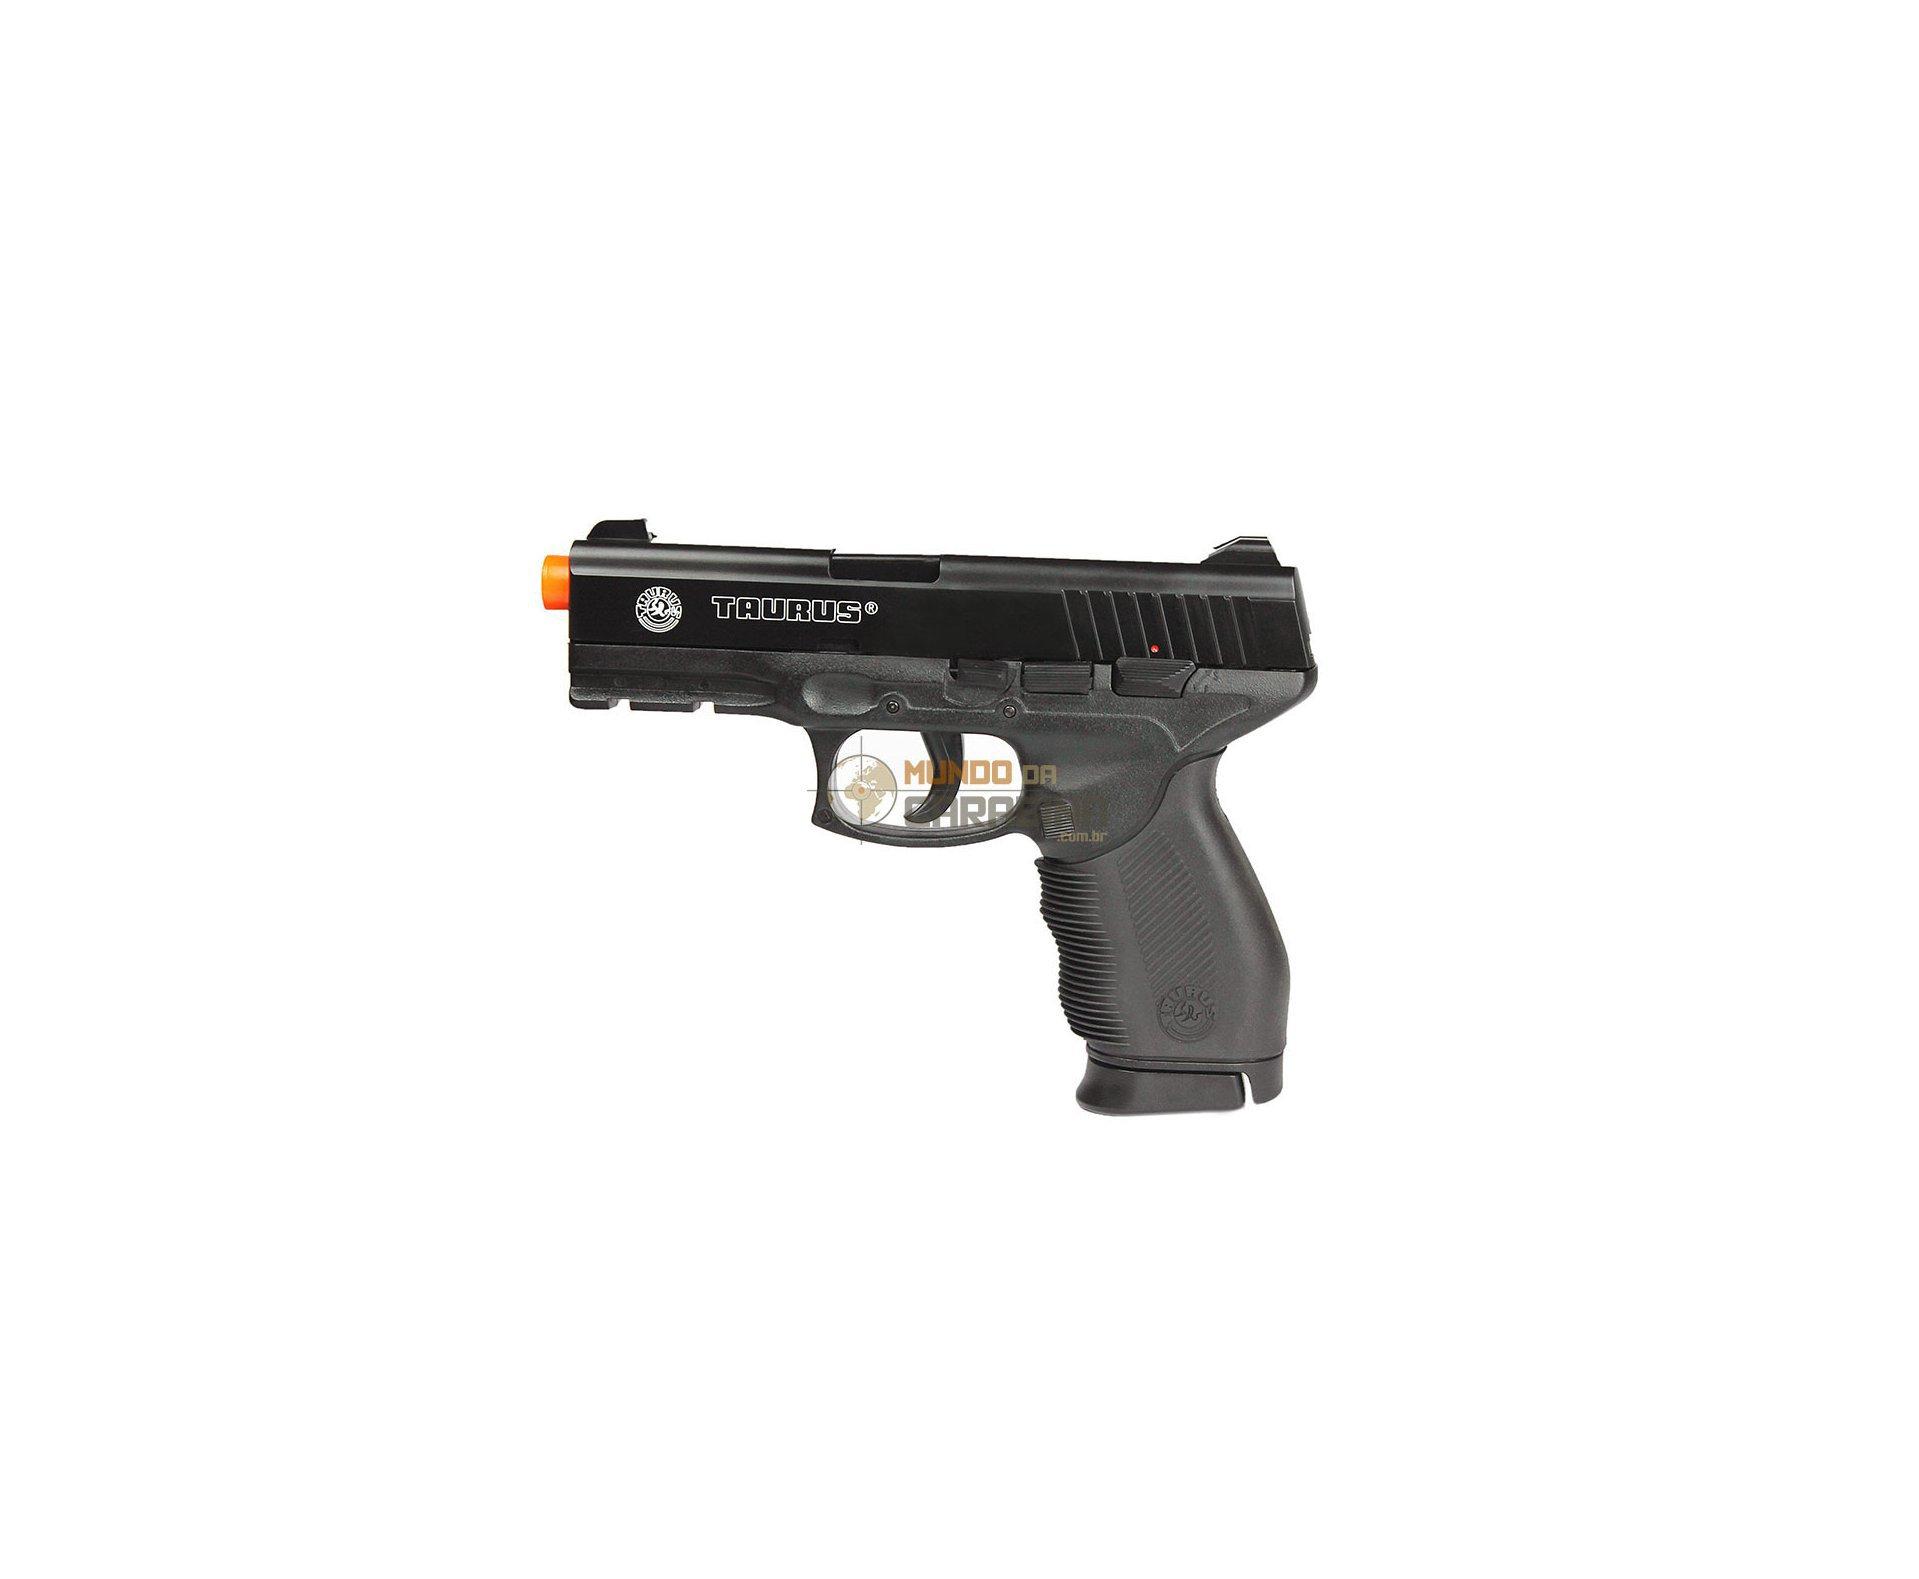 Pistola De Airsoft Pt 24/7 Semi/metal + 4000 Esferas 0,12g + Capa Almofada - Cyber Gun